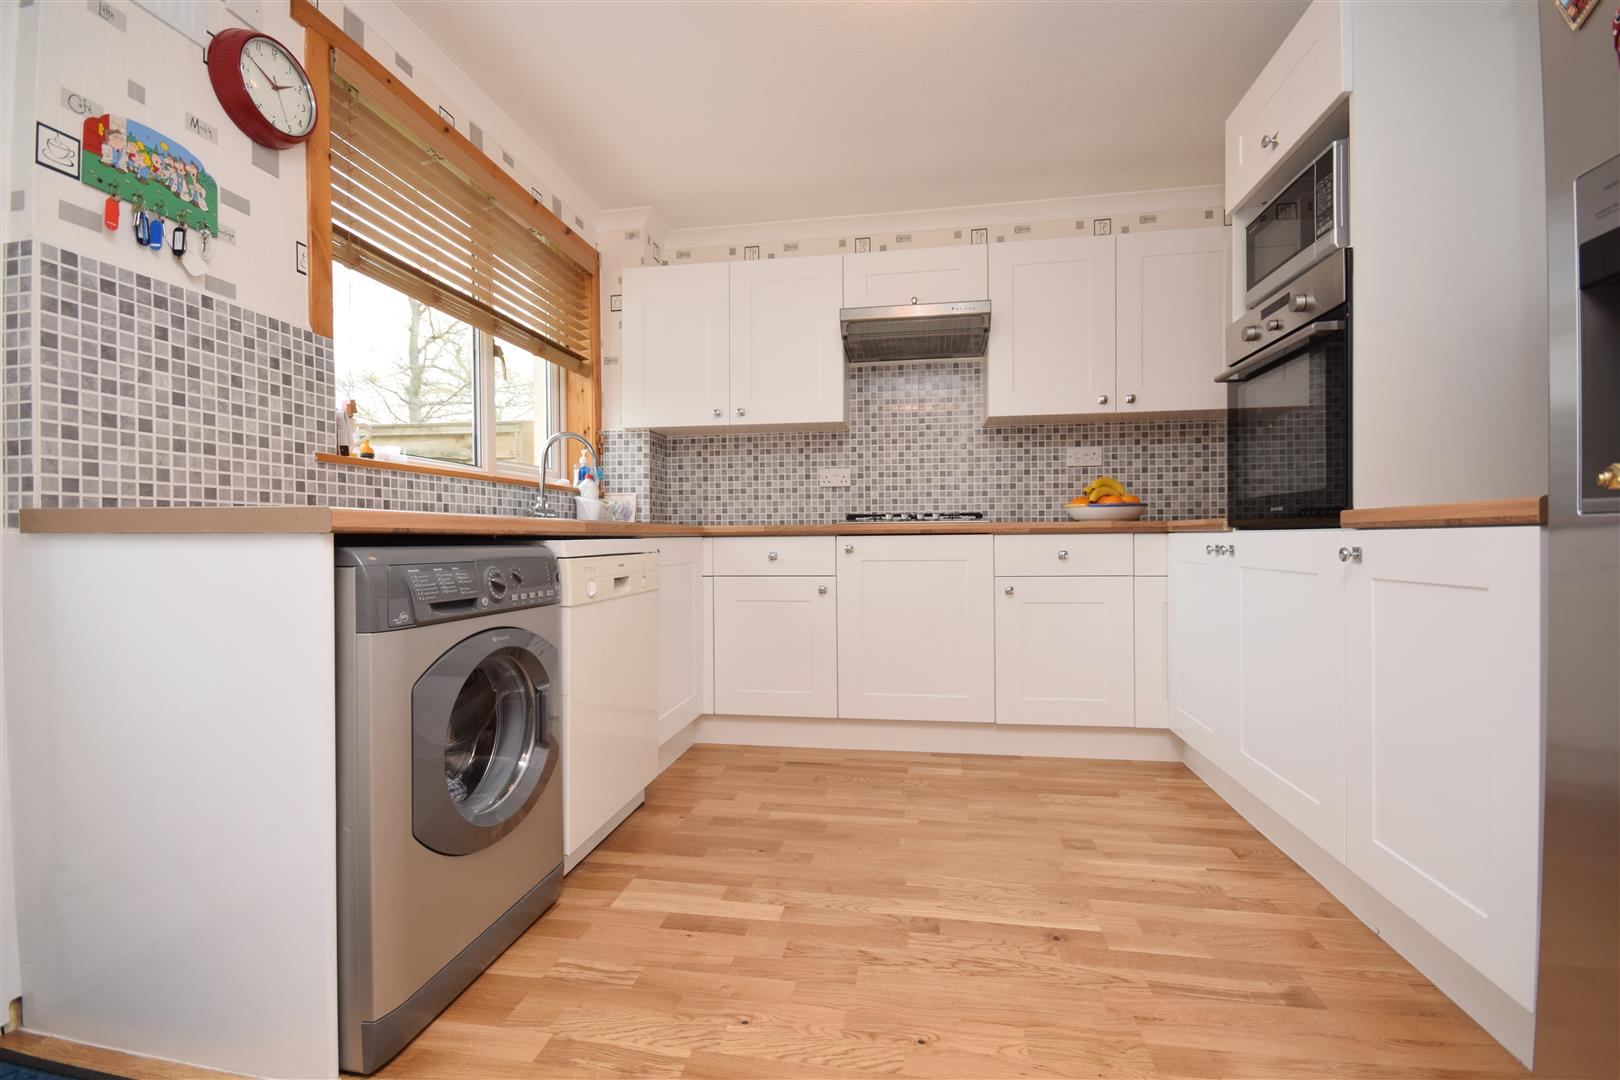 28, Garry Place, Bankfoot, Perthshire, PH1 4DA, UK